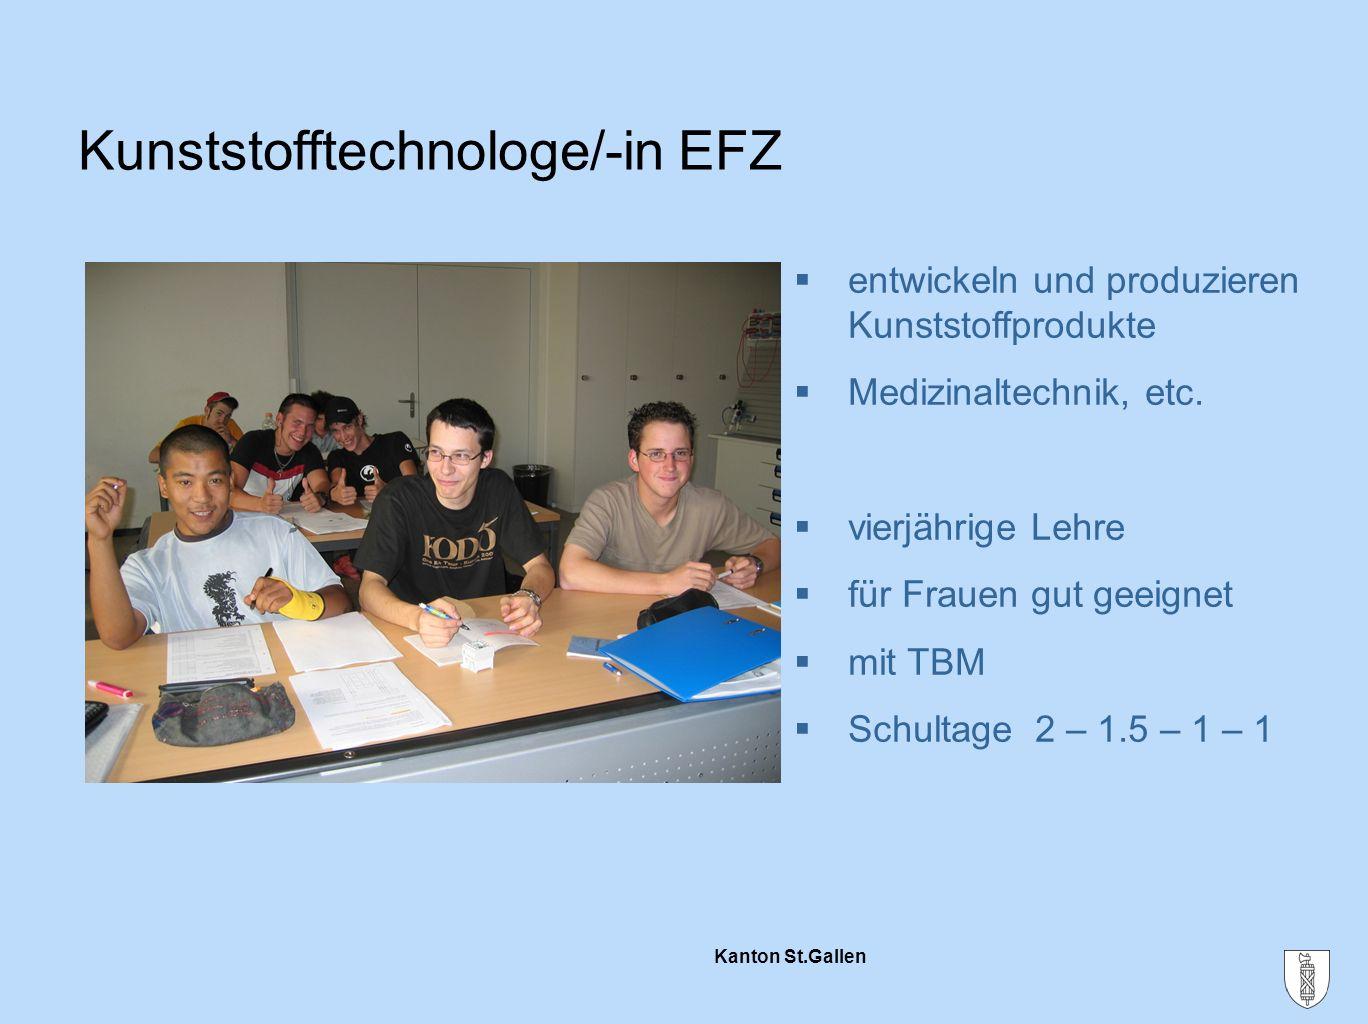 Kunststofftechnologe/-in EFZ